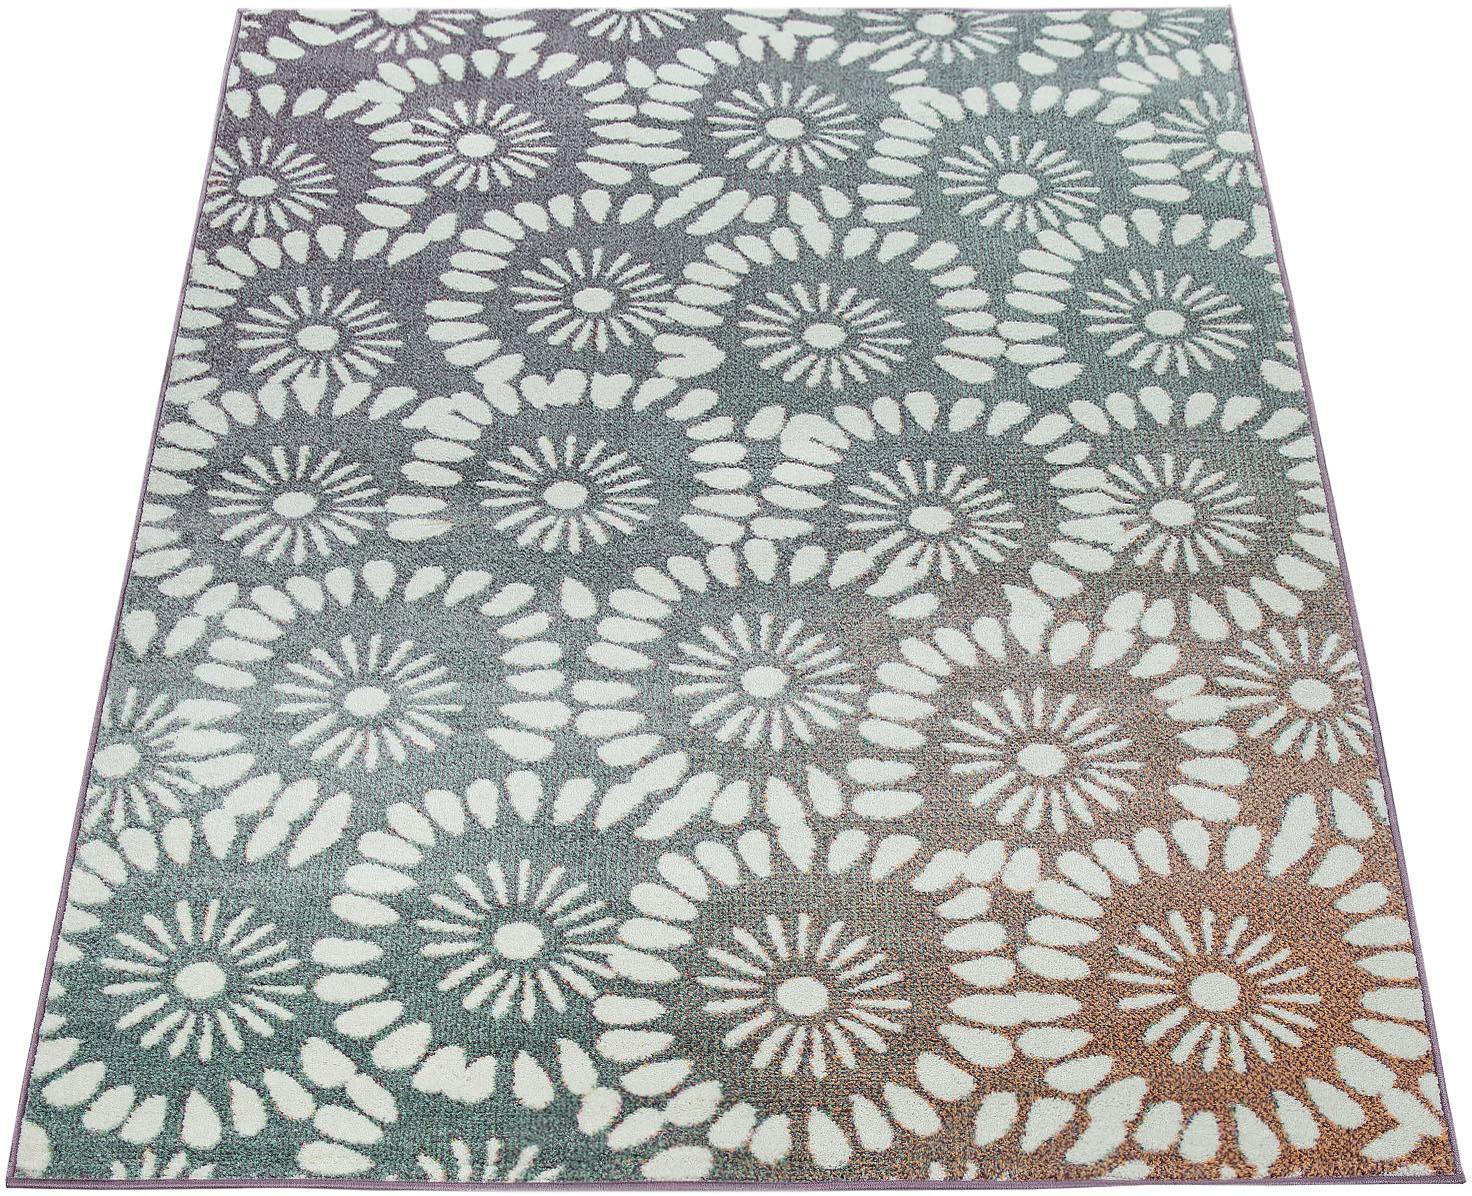 Teppich Stella 514 Paco Home rechteckig Höhe 17 mm maschinell gewebt